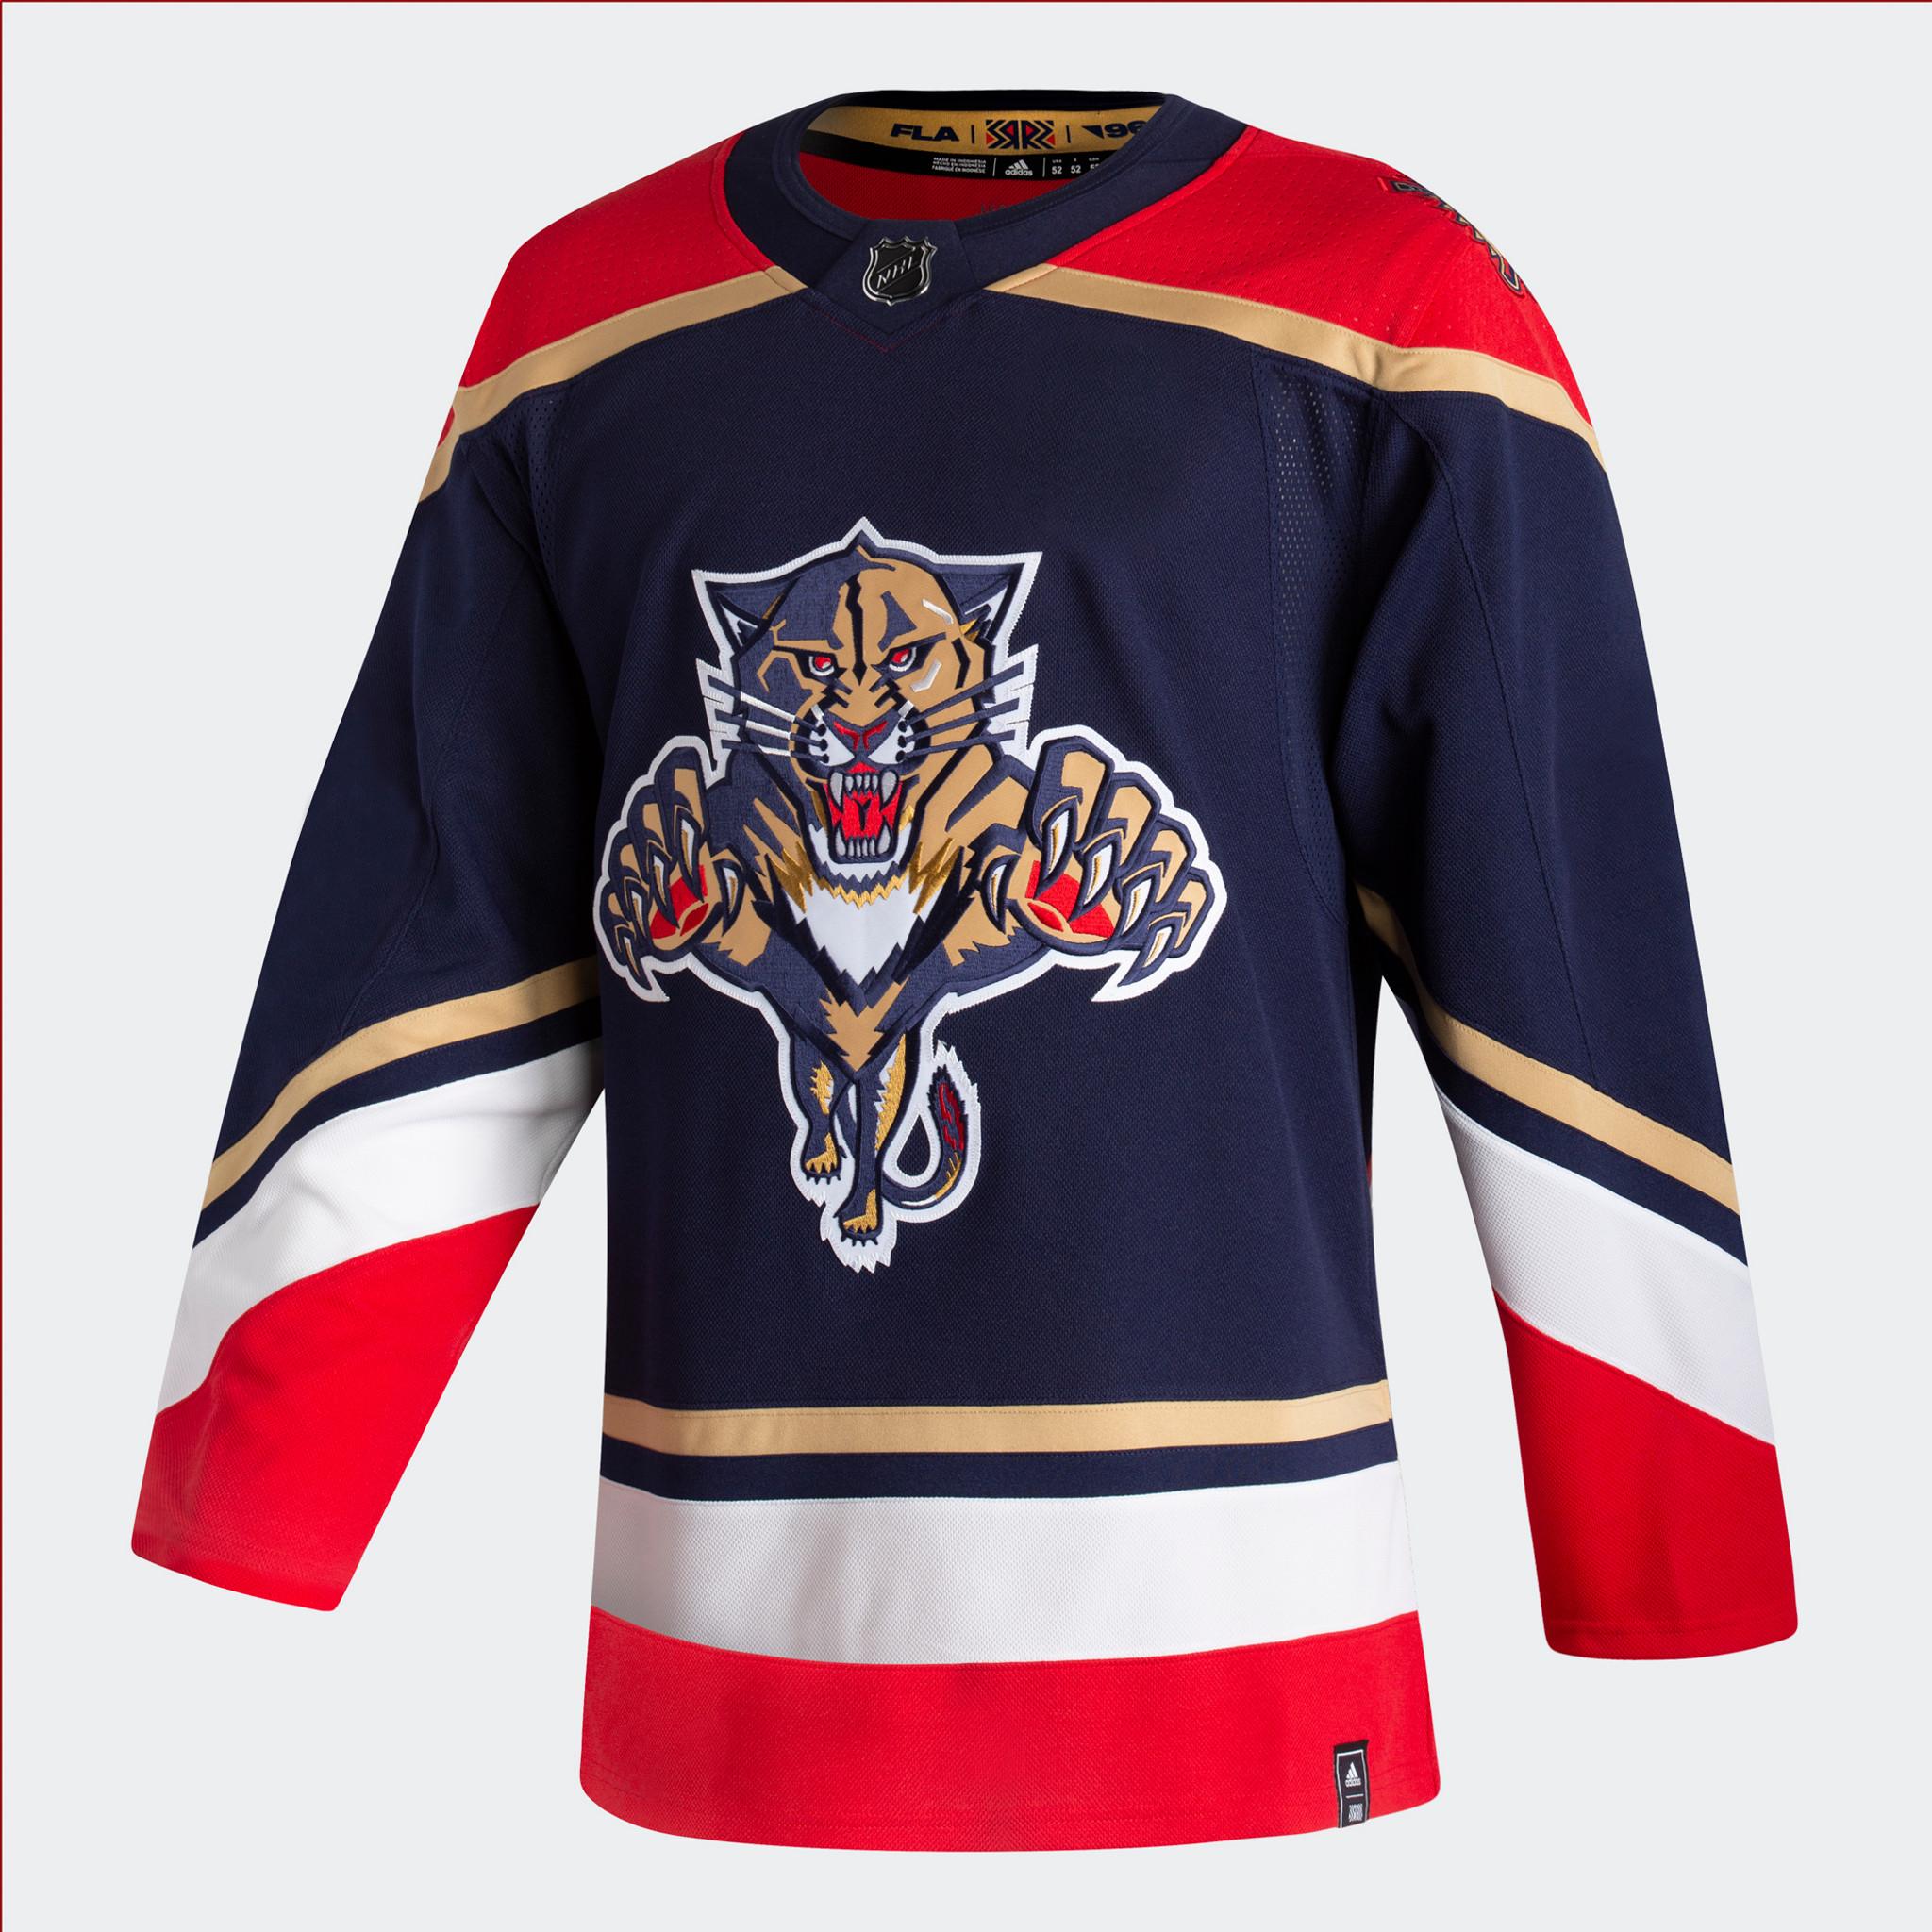 panthers jersey